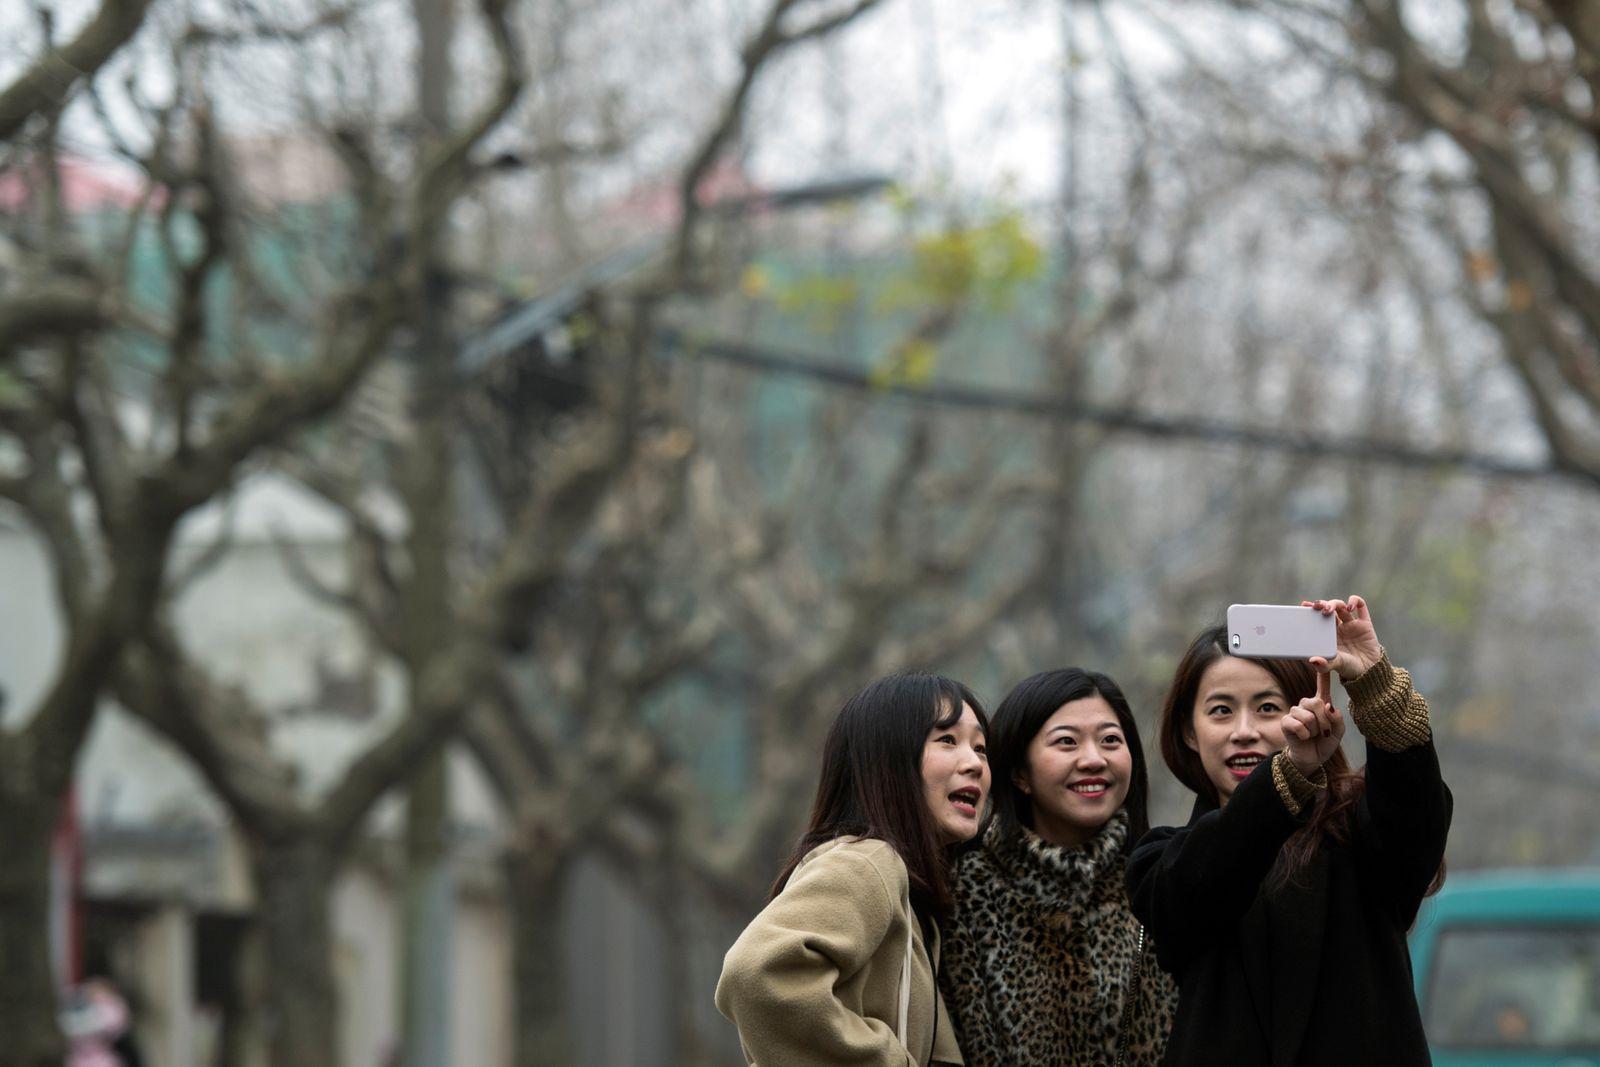 CHINA-TECHNOLOGY-LIFESTYLE-APPS-SELFIES-MEITU